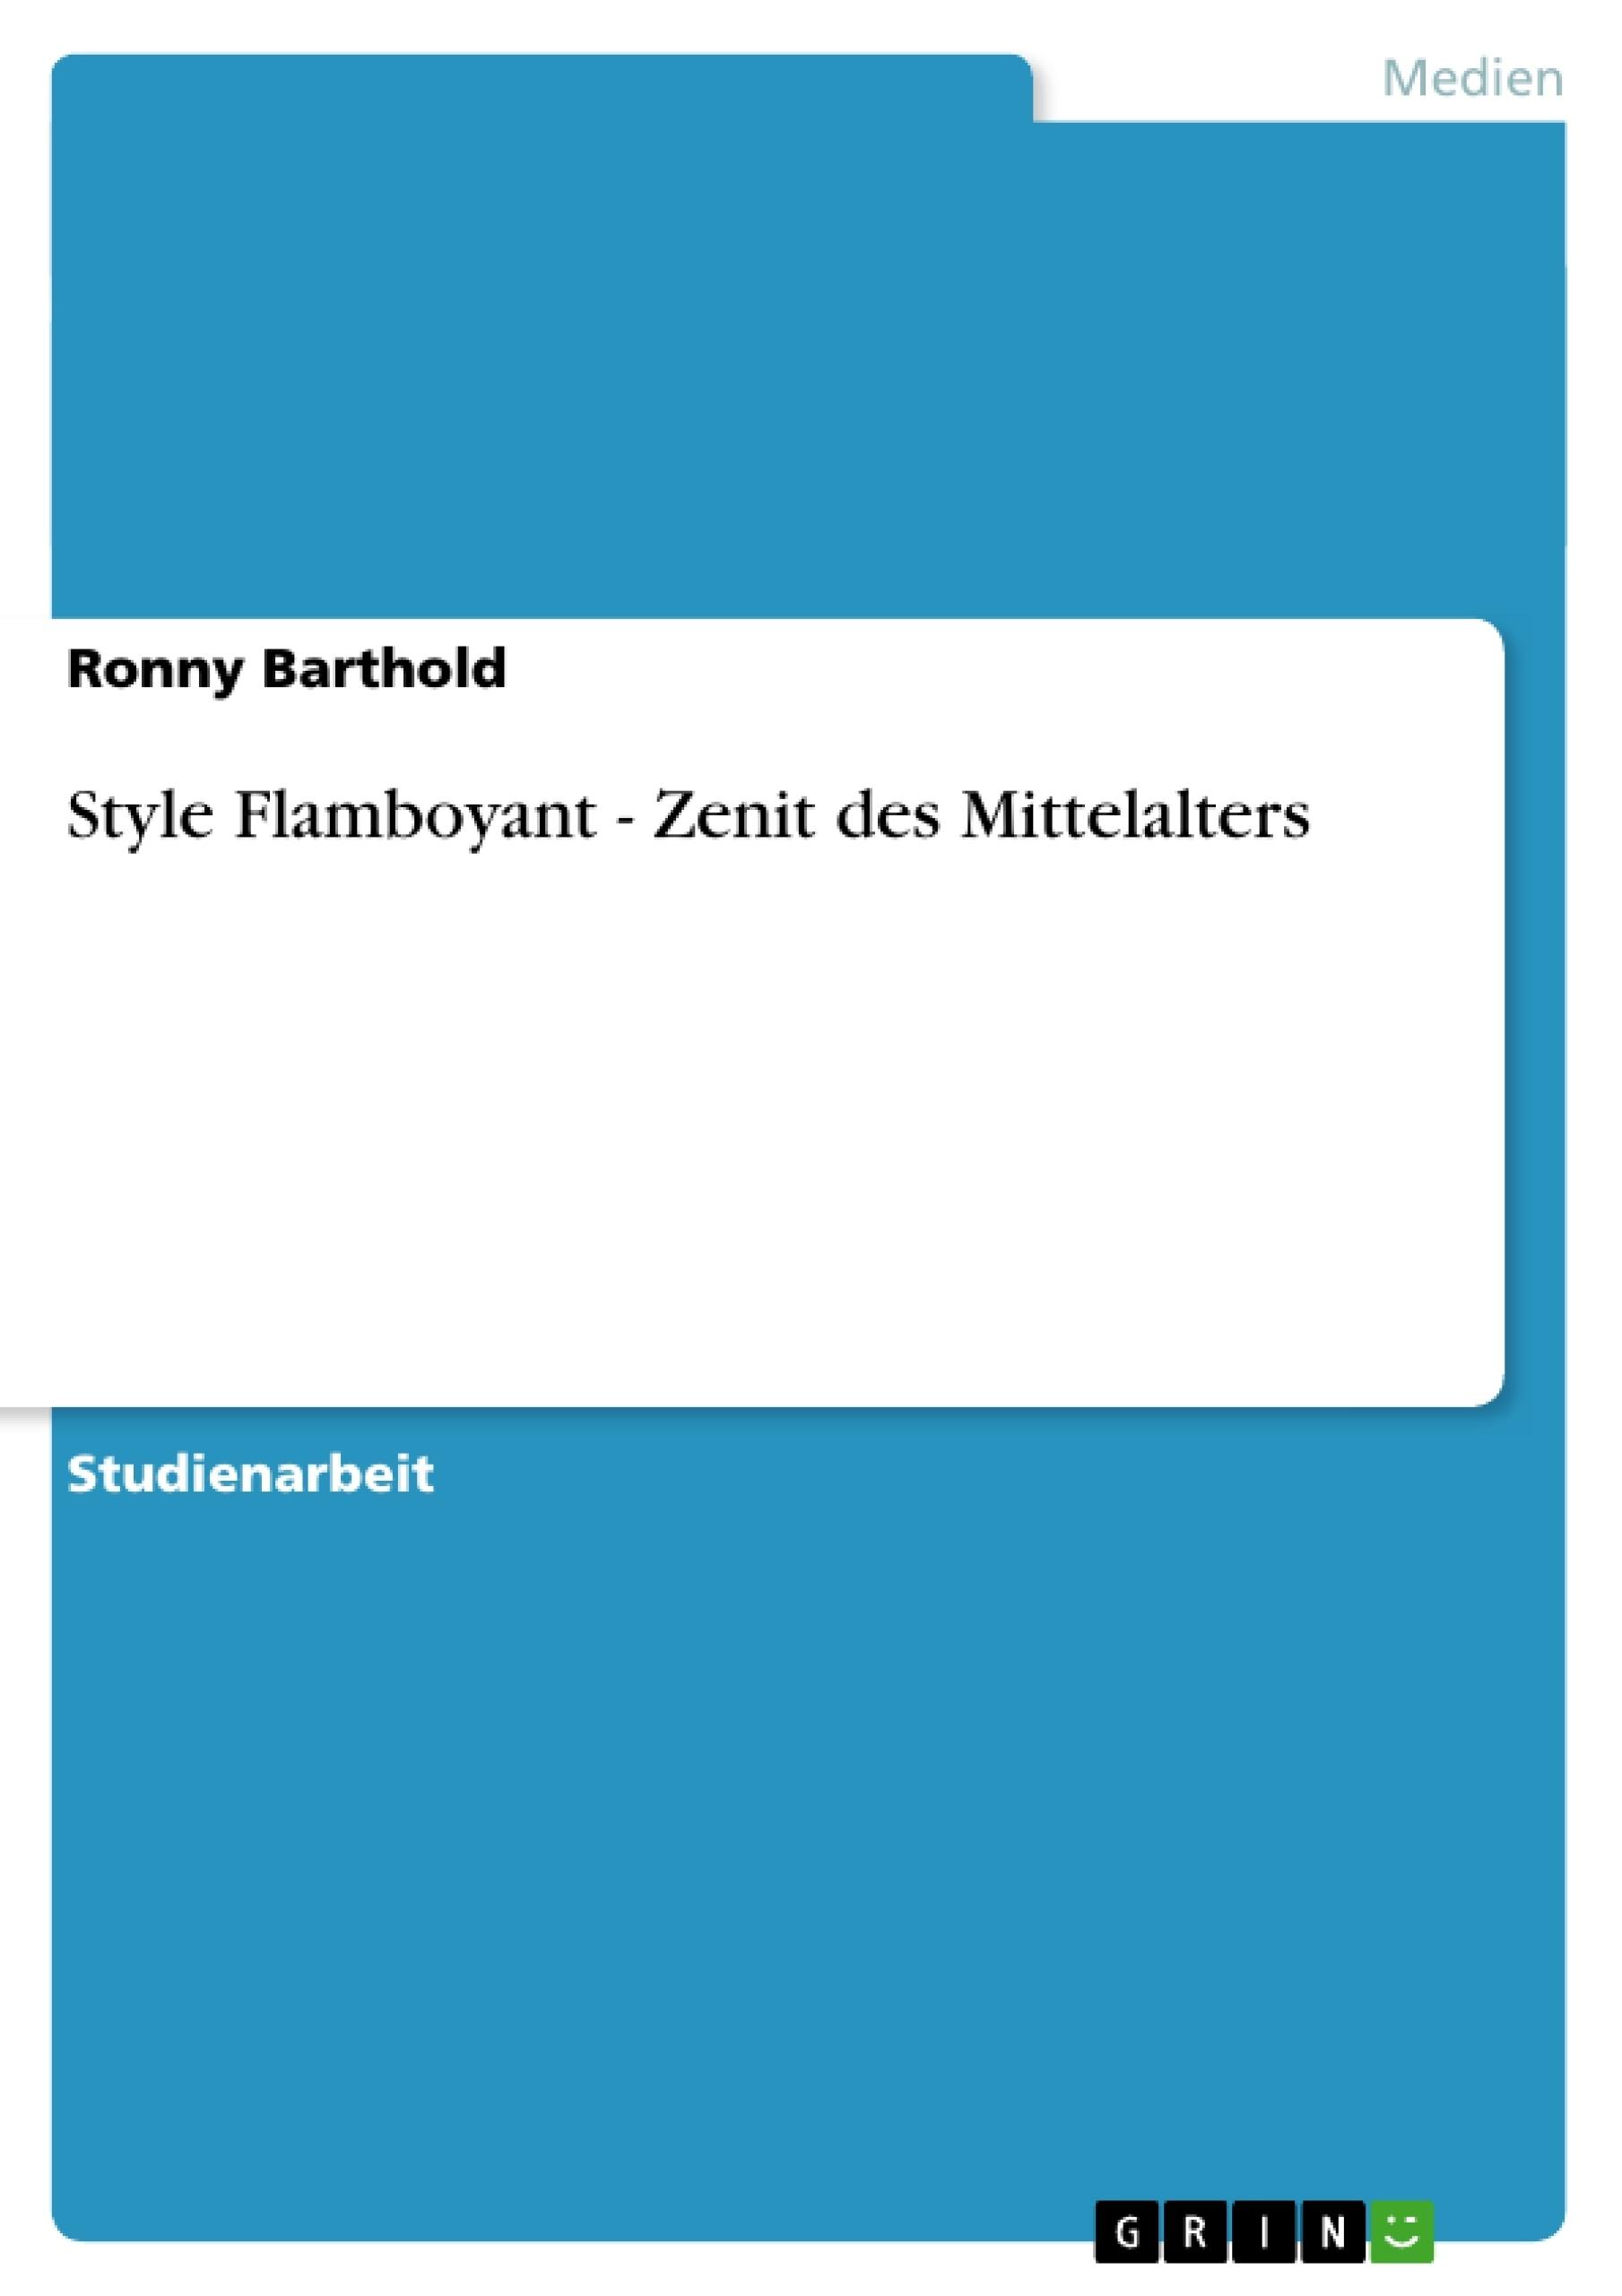 Titel: Style Flamboyant - Zenit des Mittelalters